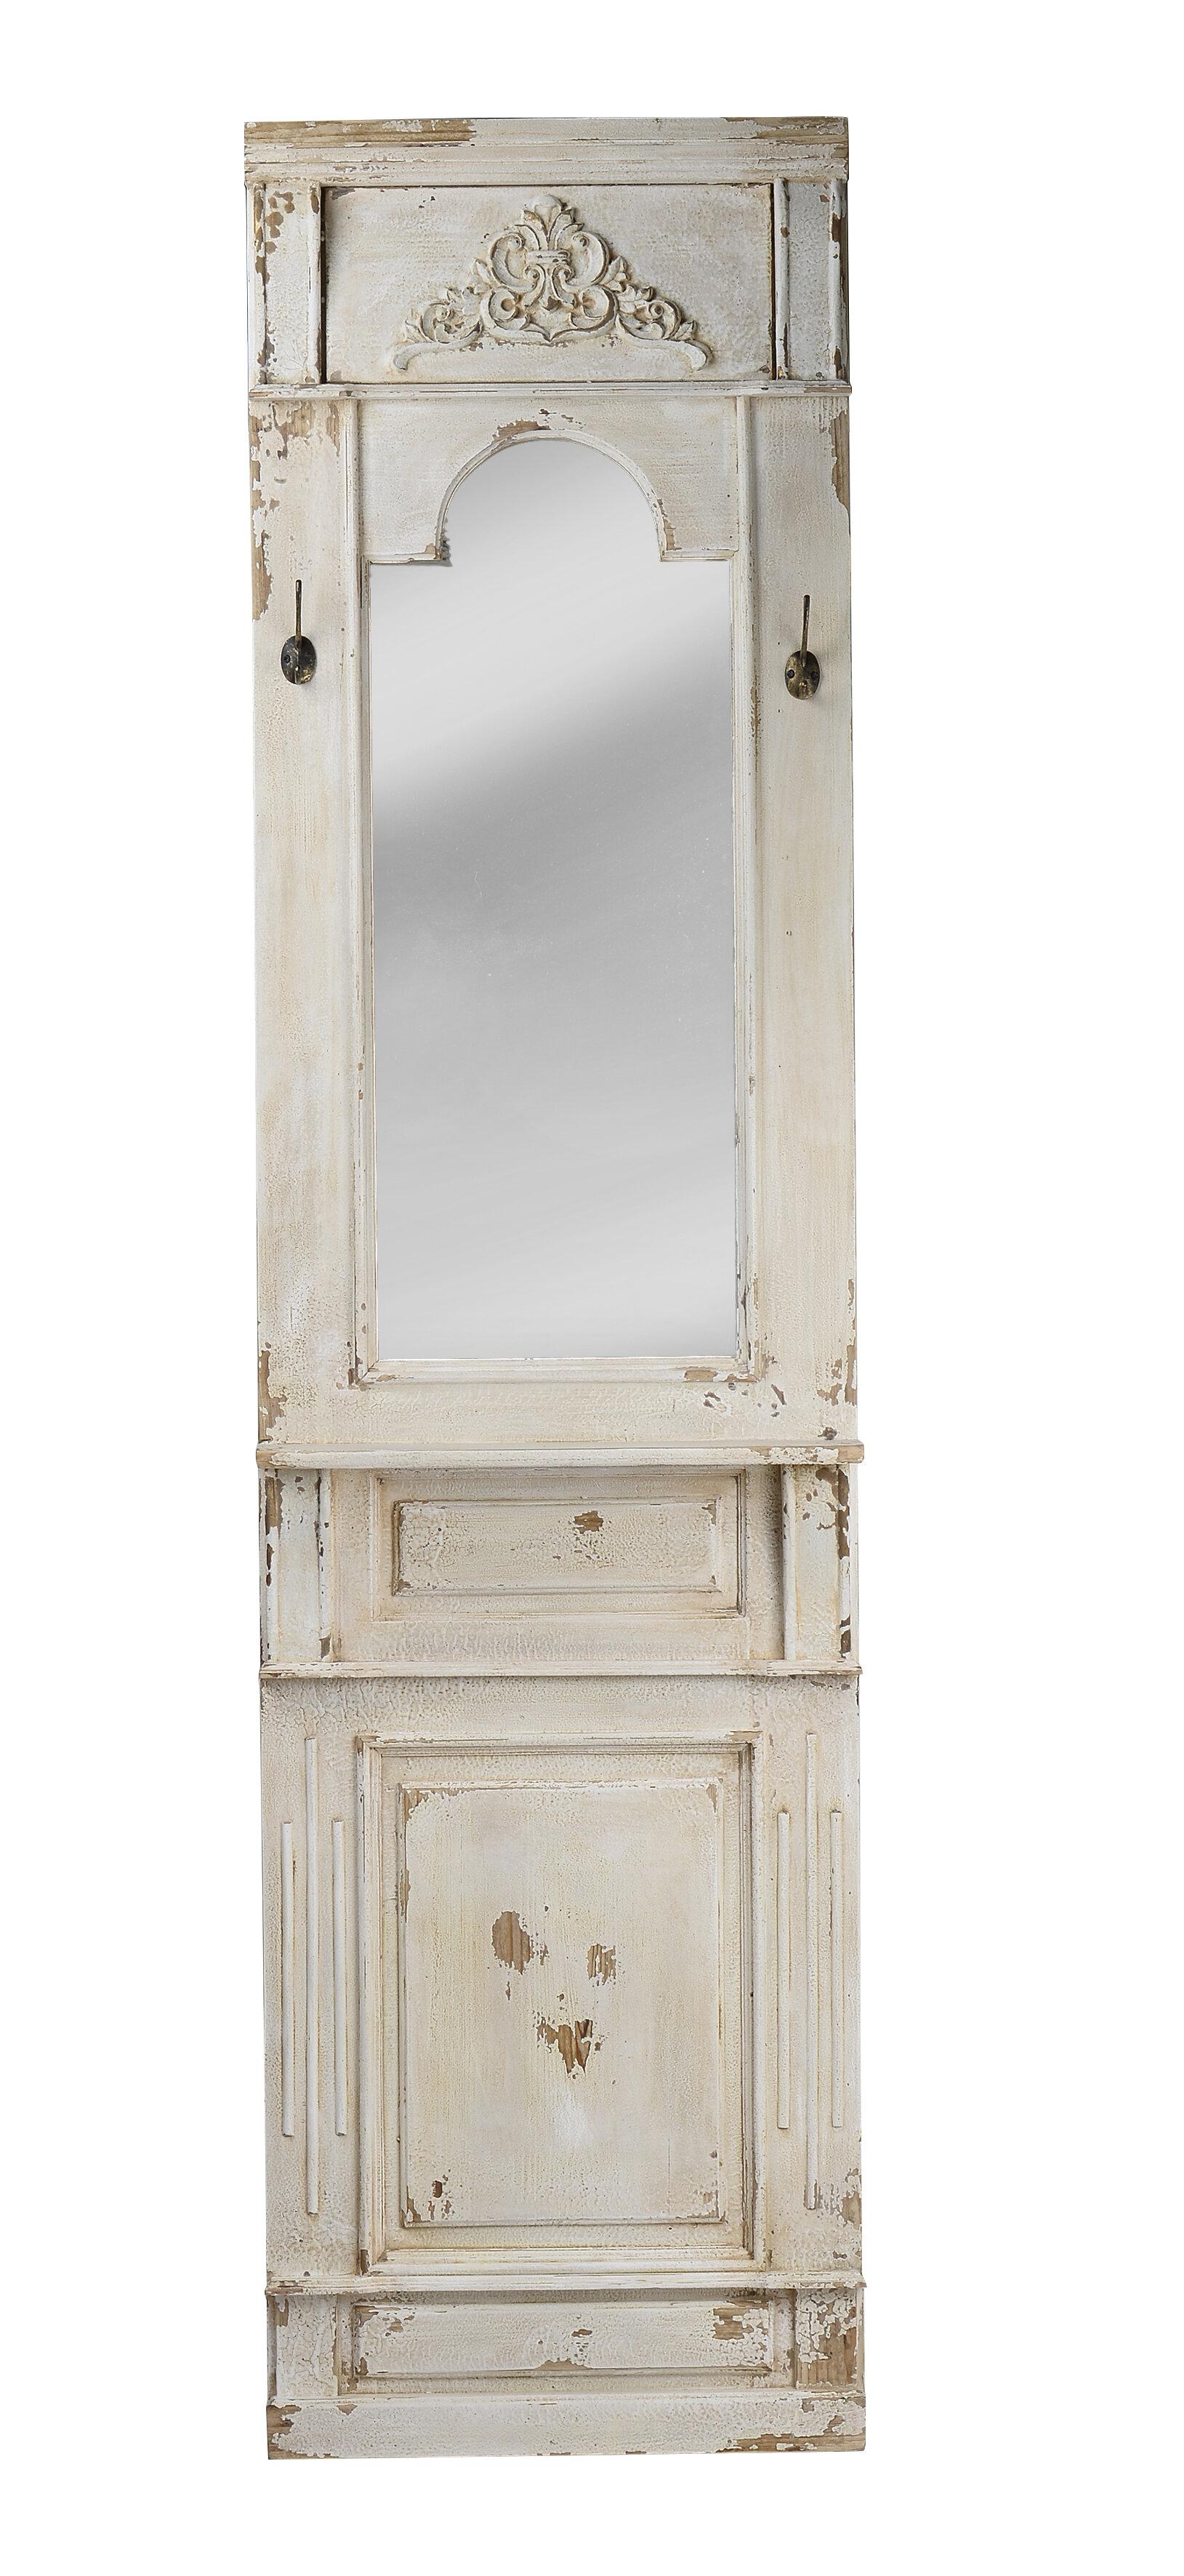 Gracie Oaks Lasseter Classic Vintage Wall Full Length Mirror Wayfair